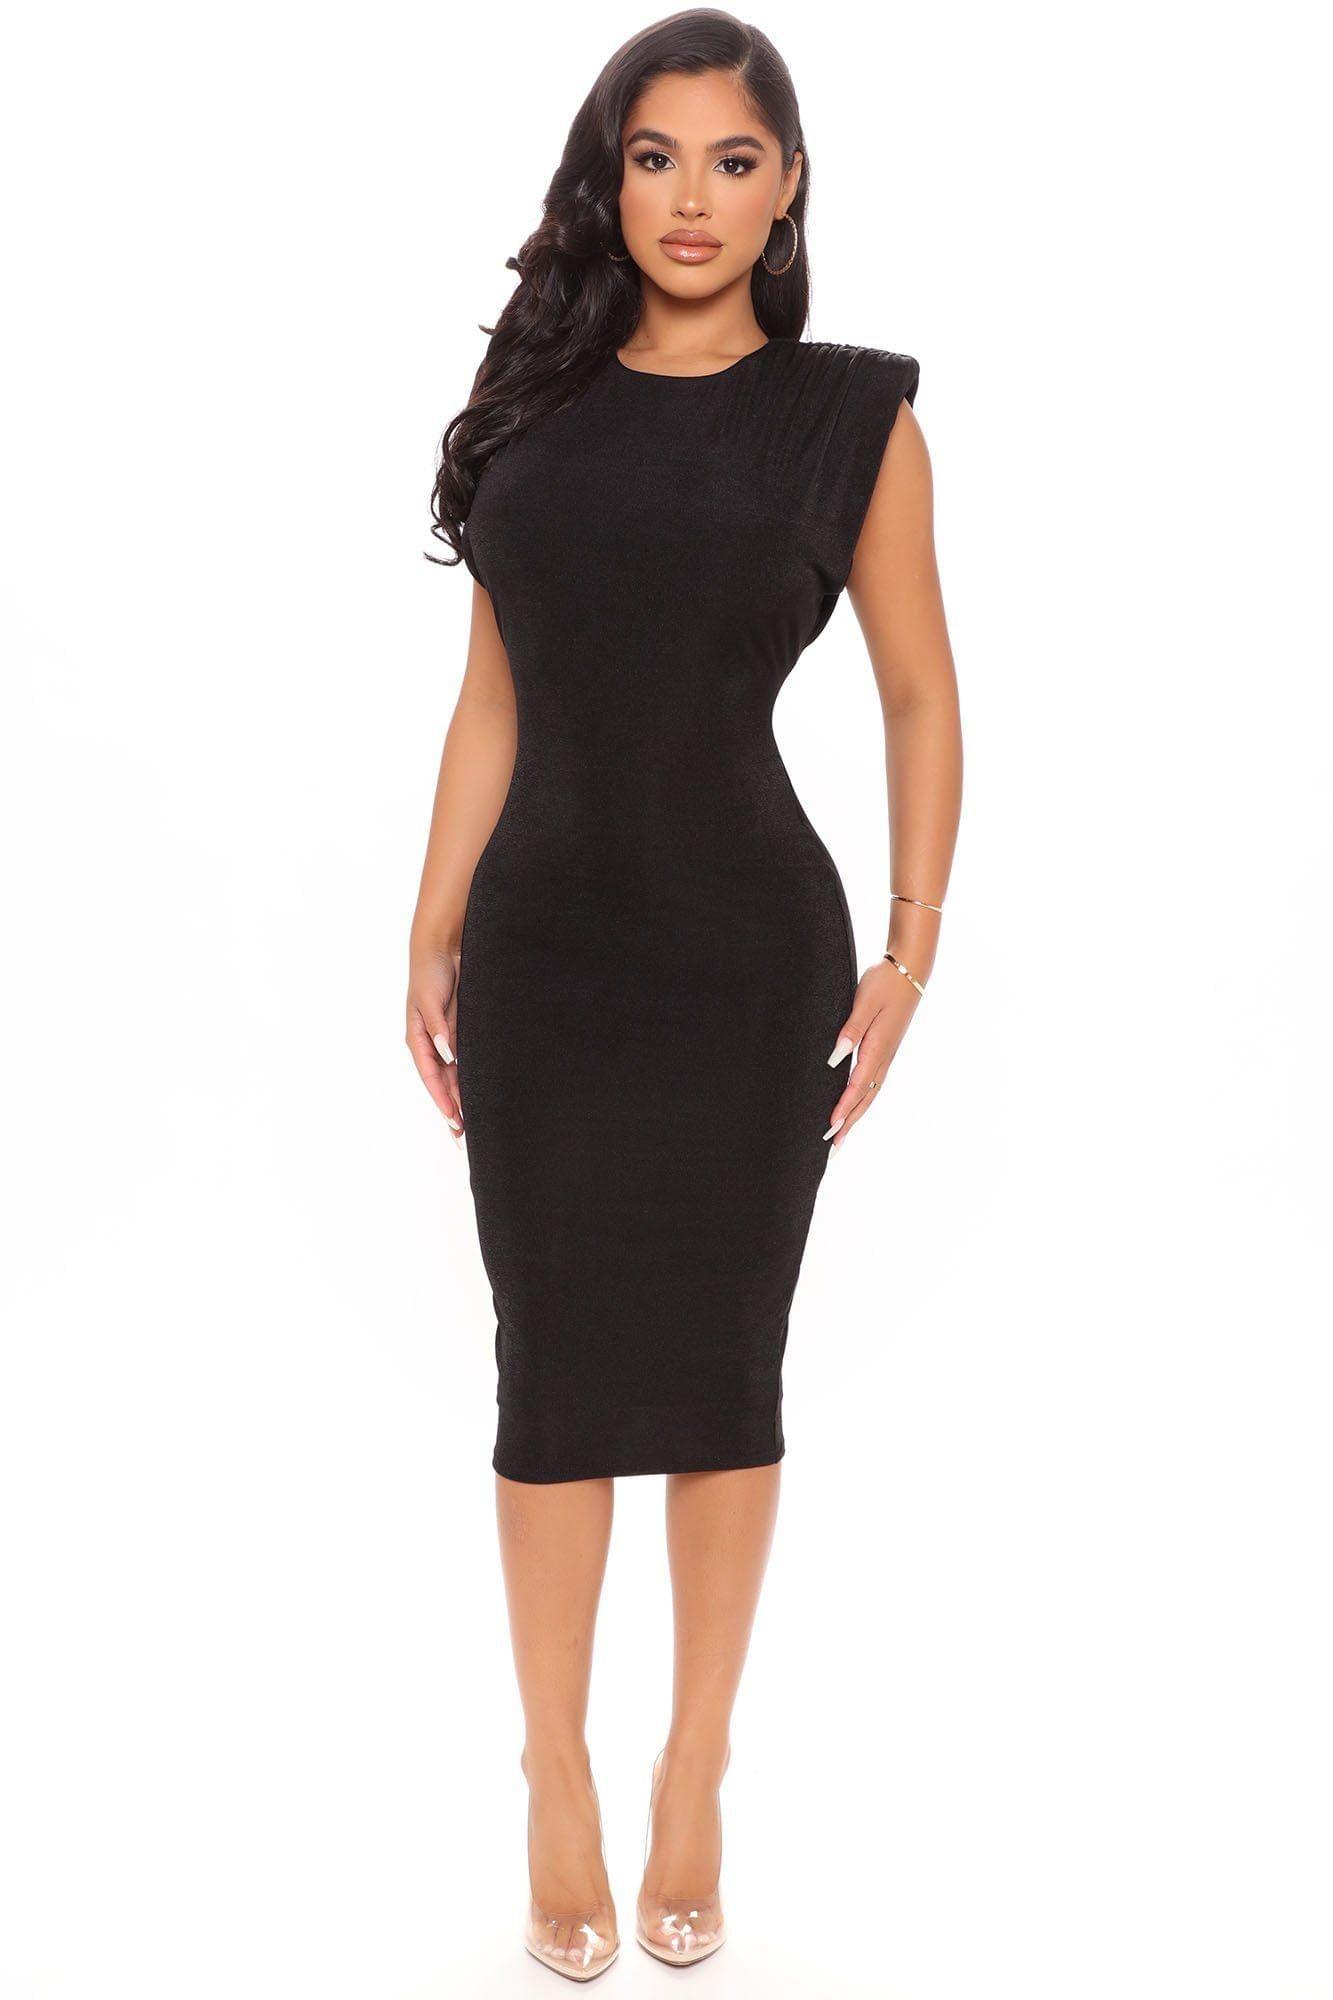 Women Love Bunch Shoulder Pad Midi Dress Black 27 Black Midi Dress High Neck Black Dress Midi Dress Bodycon [ 2000 x 1333 Pixel ]